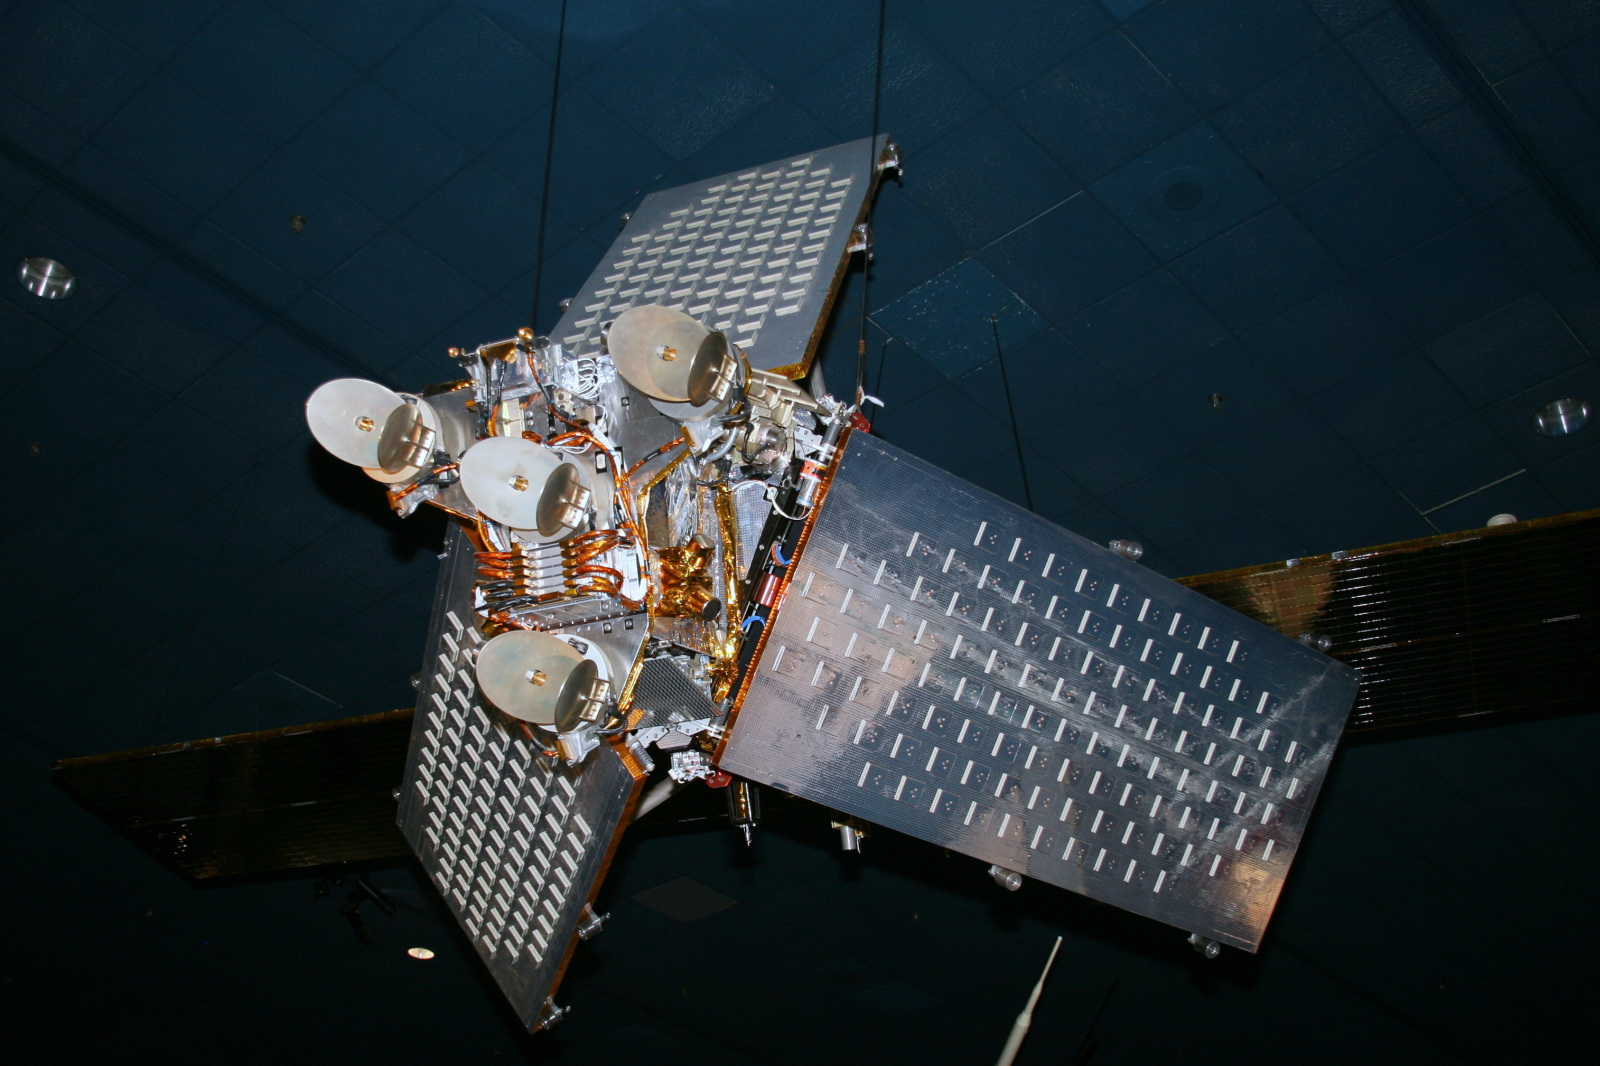 Iridium invests in Scottish satellite navigation company DDK Positioning